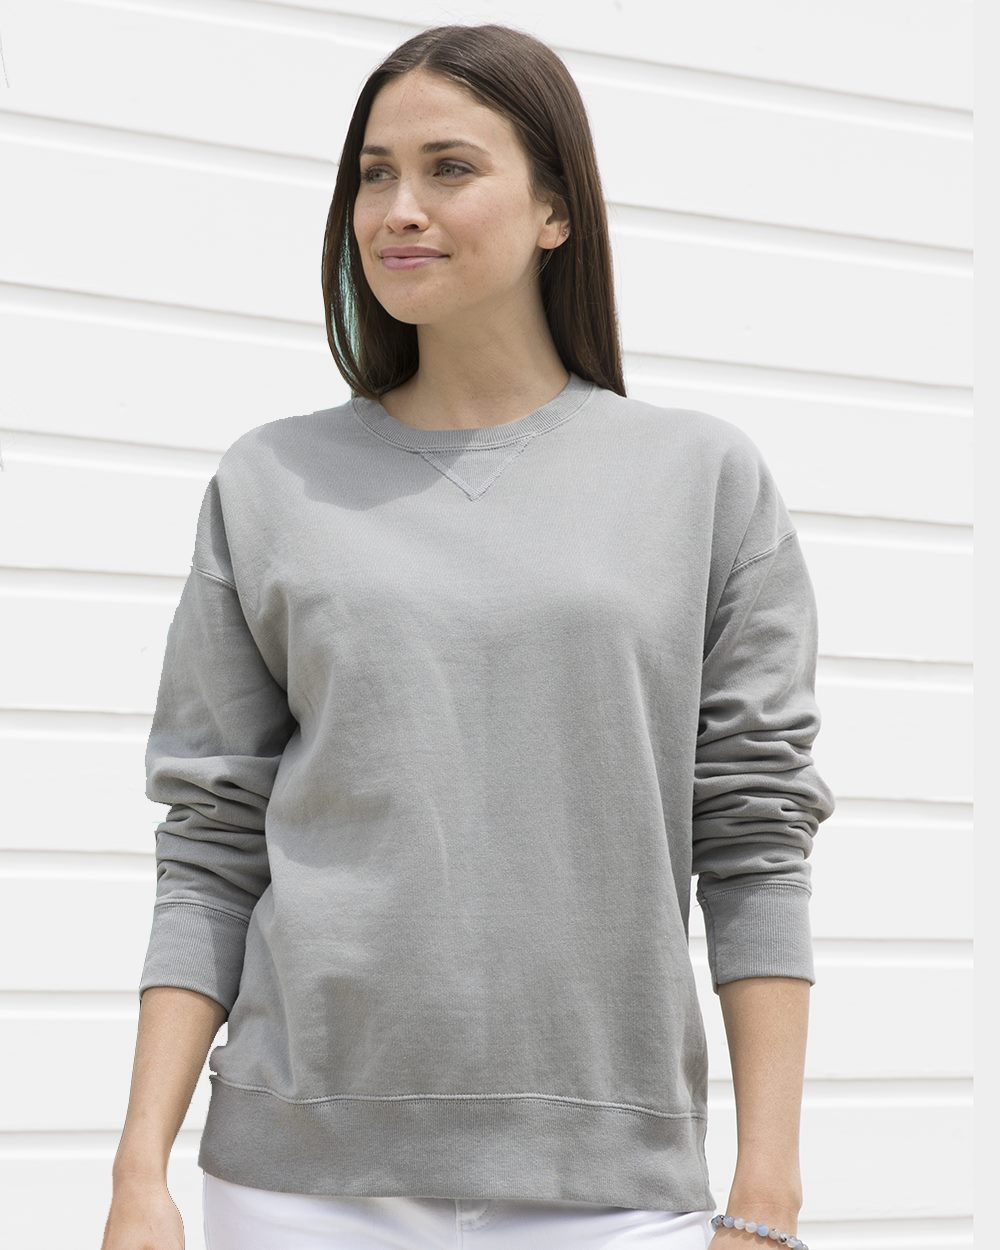 Hanes ComfortWash GDH400 - Garment Dyed Crewneck Sweatshirt